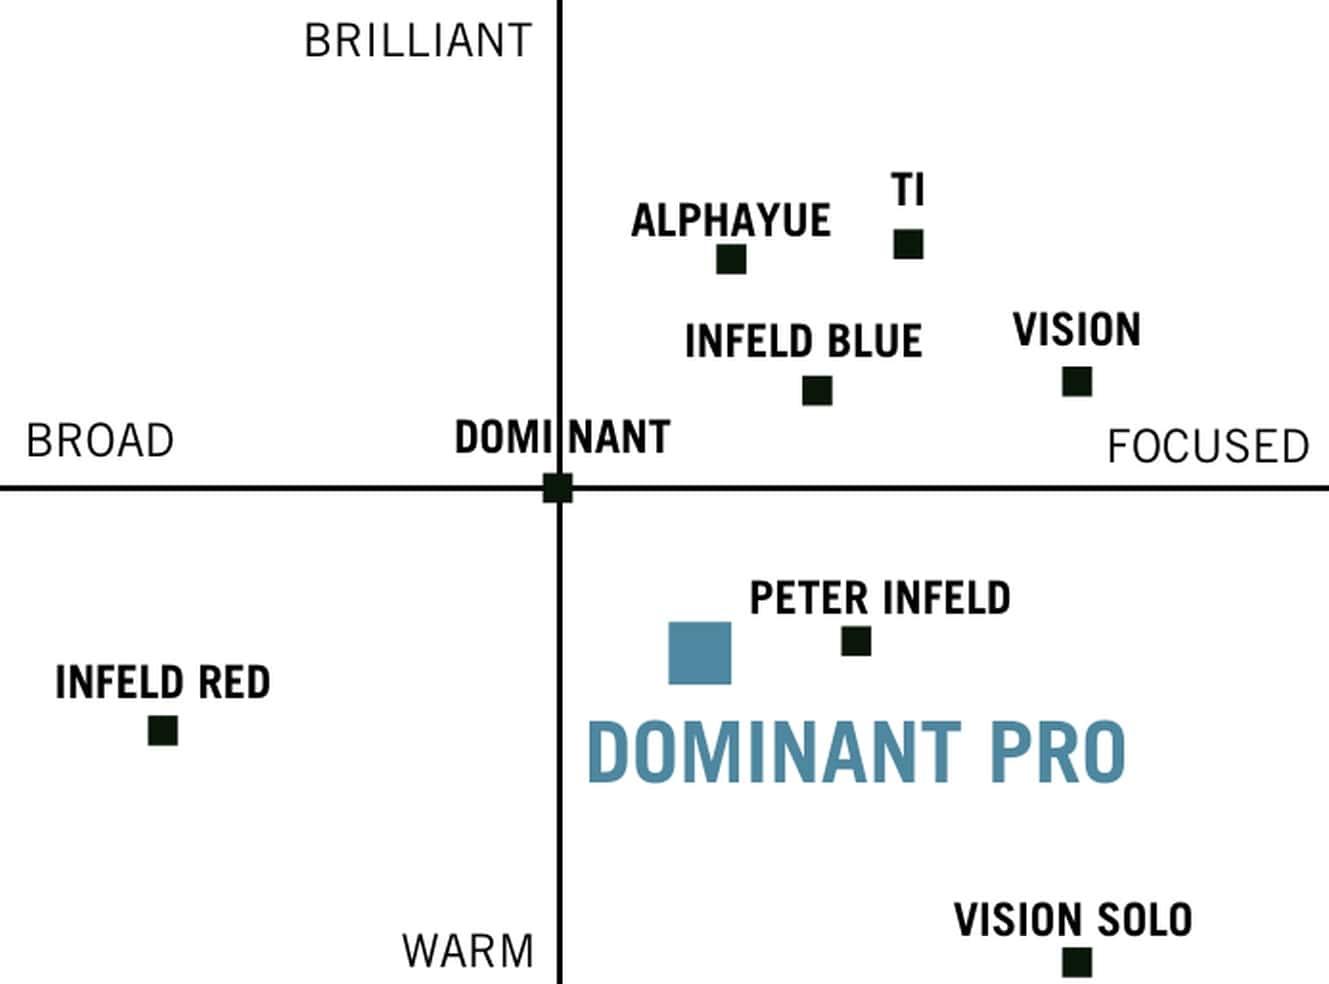 soundchart-dominant-pro-min